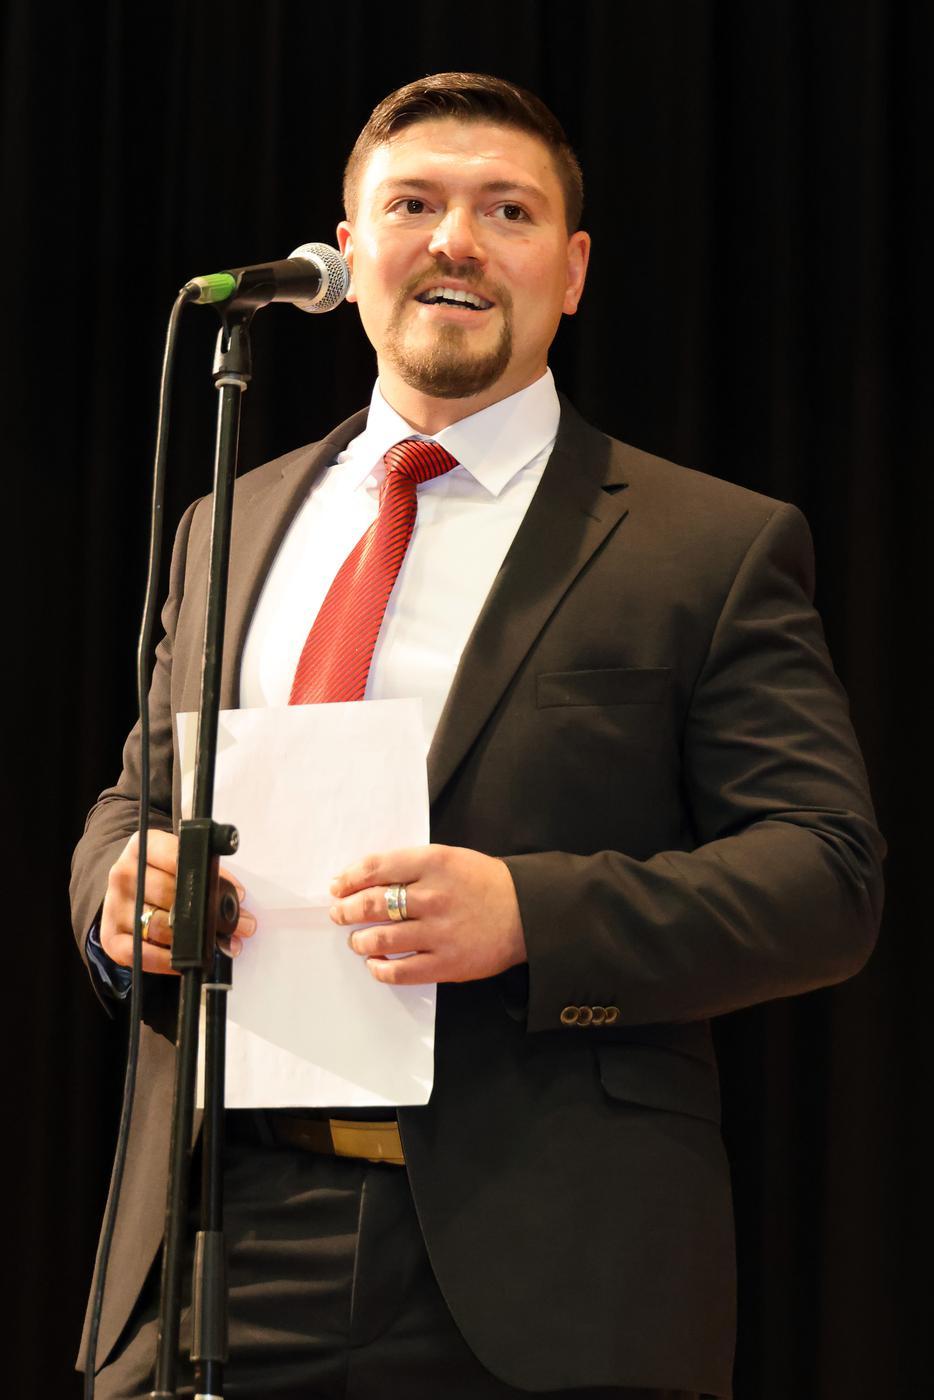 Andreas Laitenberger (34), Immobilienvertreter aus Bretten